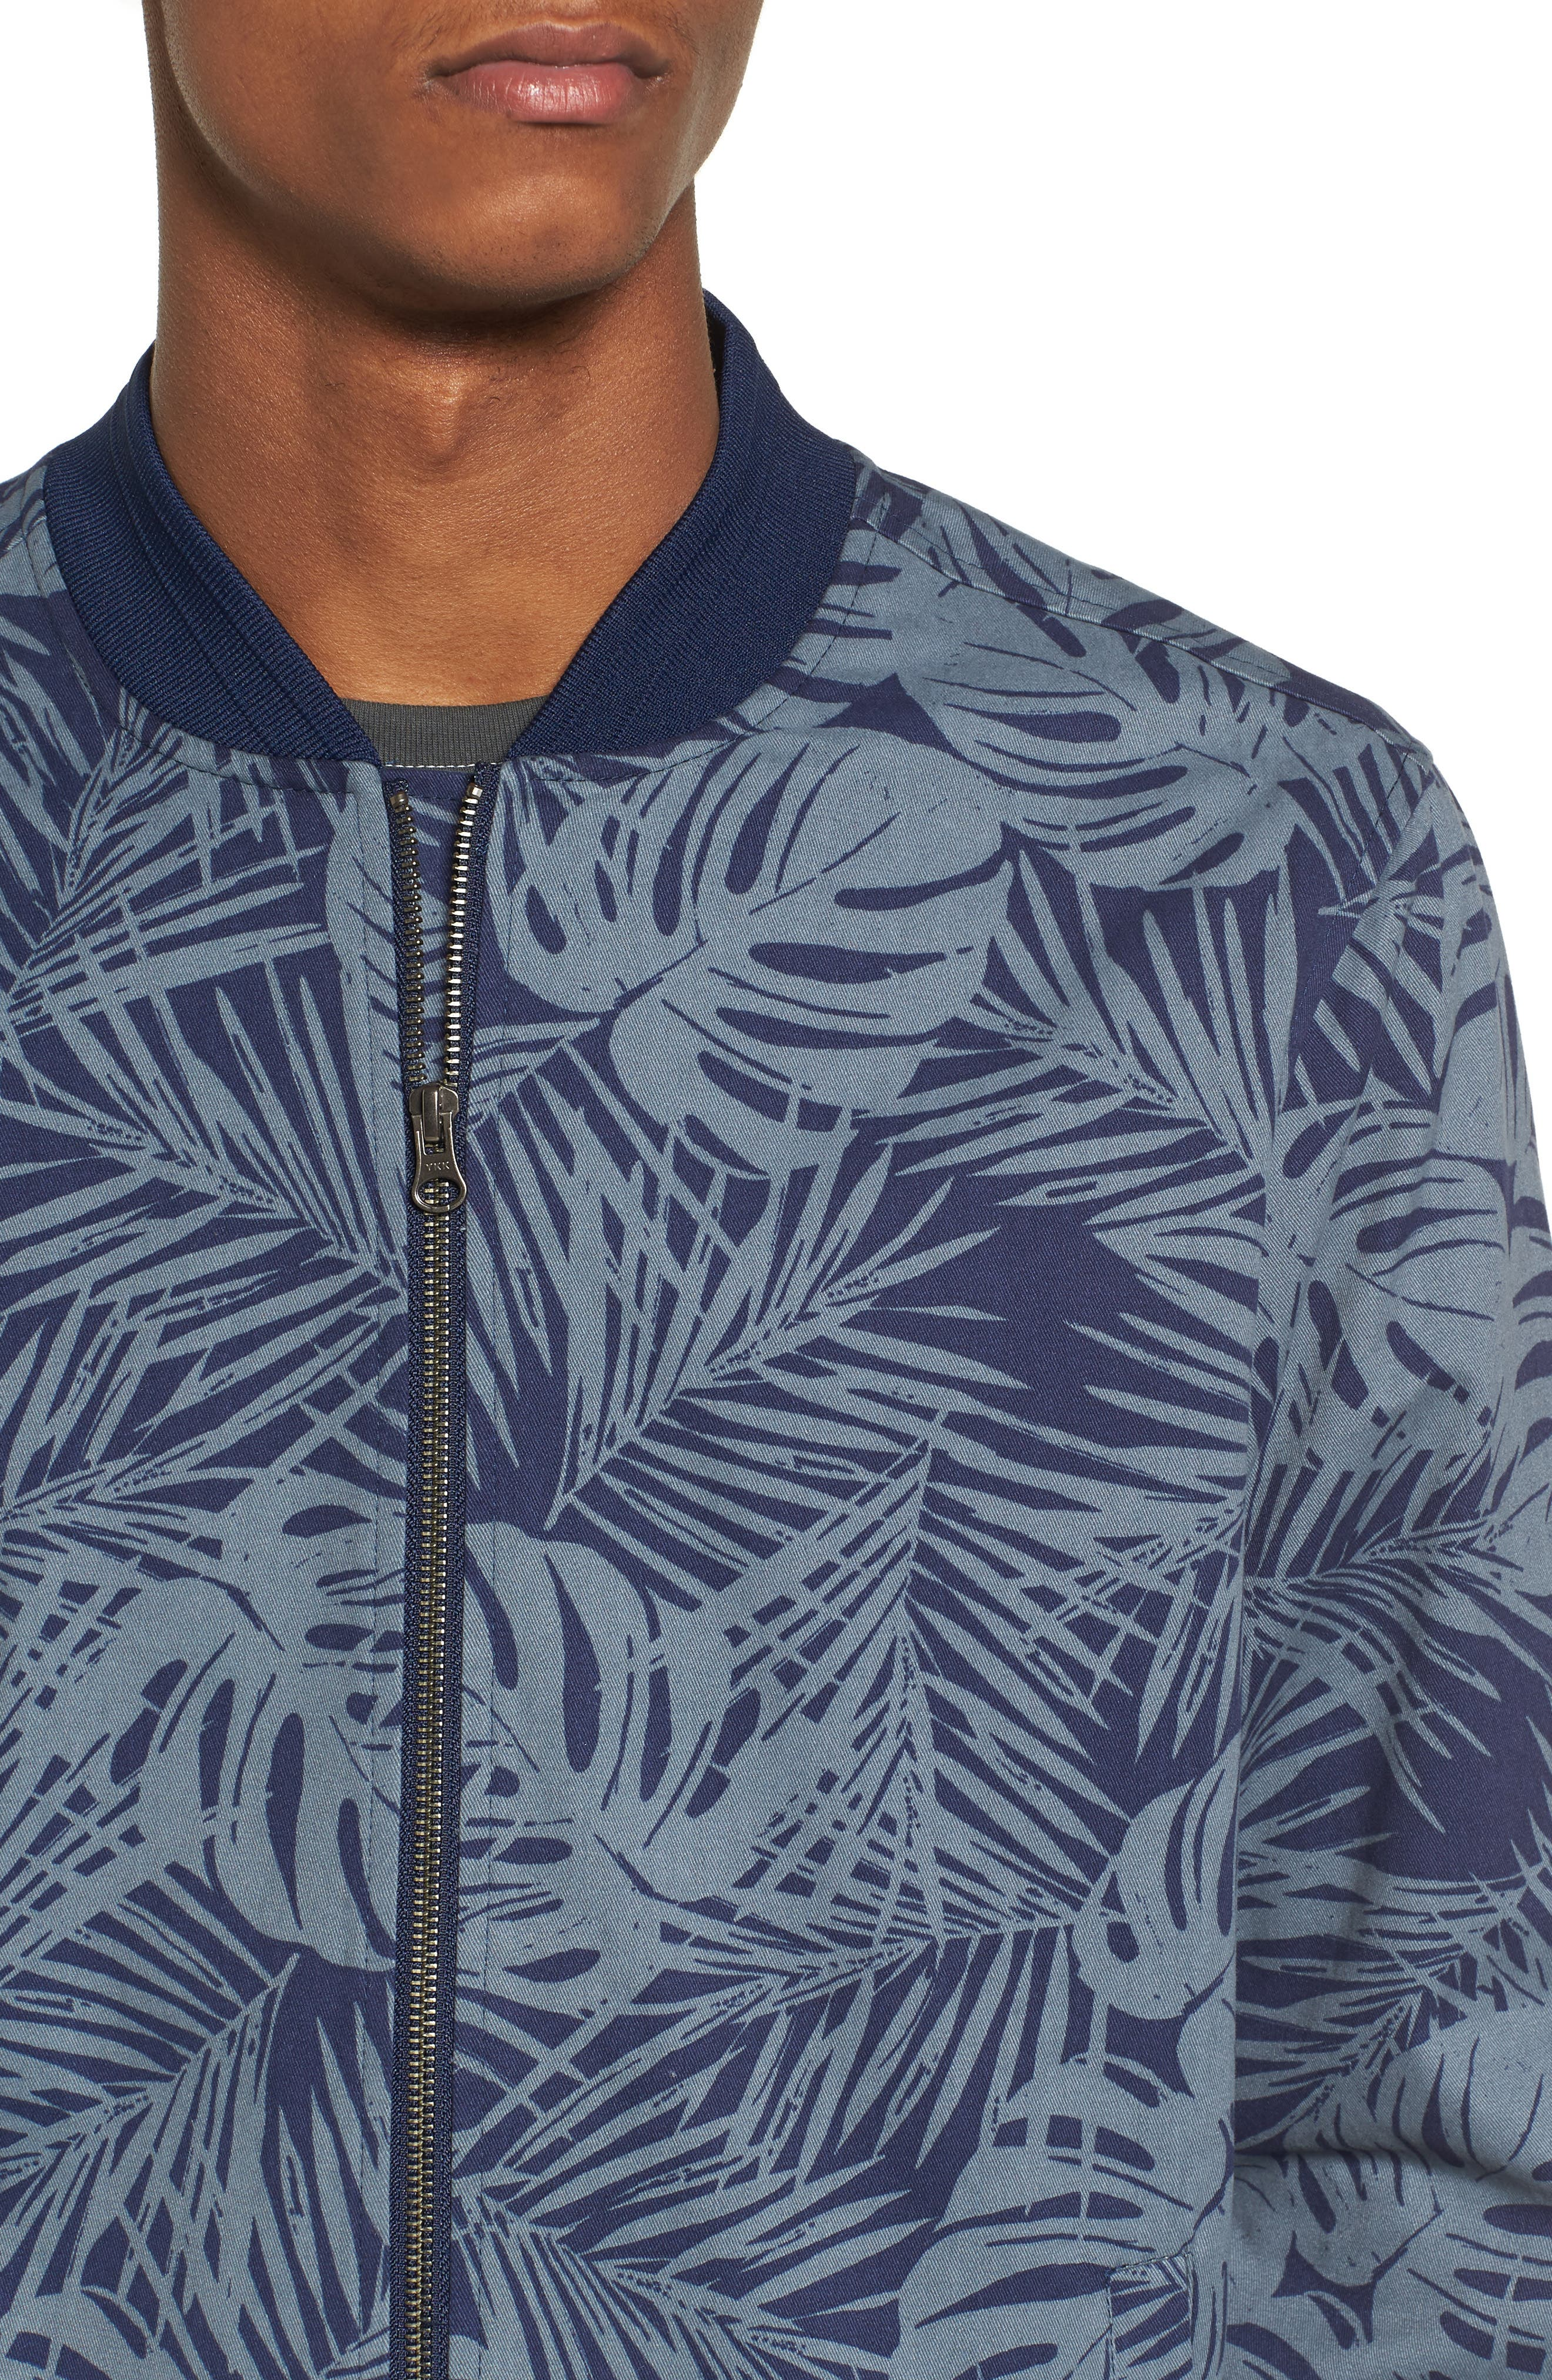 Print Bomber Jacket,                             Alternate thumbnail 4, color,                             Navy Peacoat Grey Palms